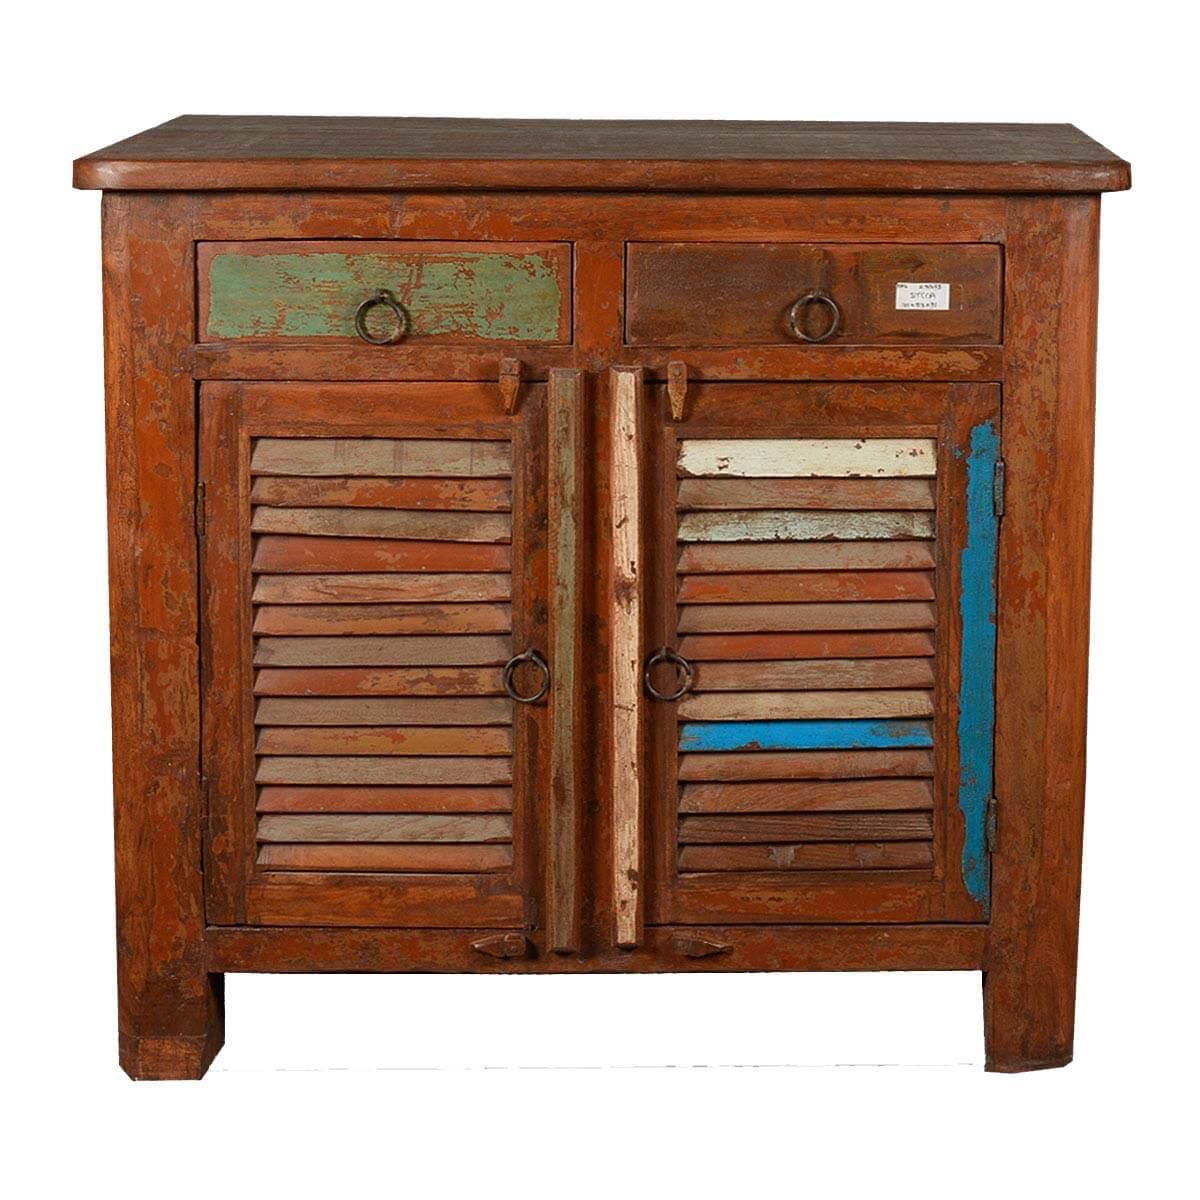 Allendale Rustic Reclaimed Wood Shutter Door 2 Drawer Storage Cabinet